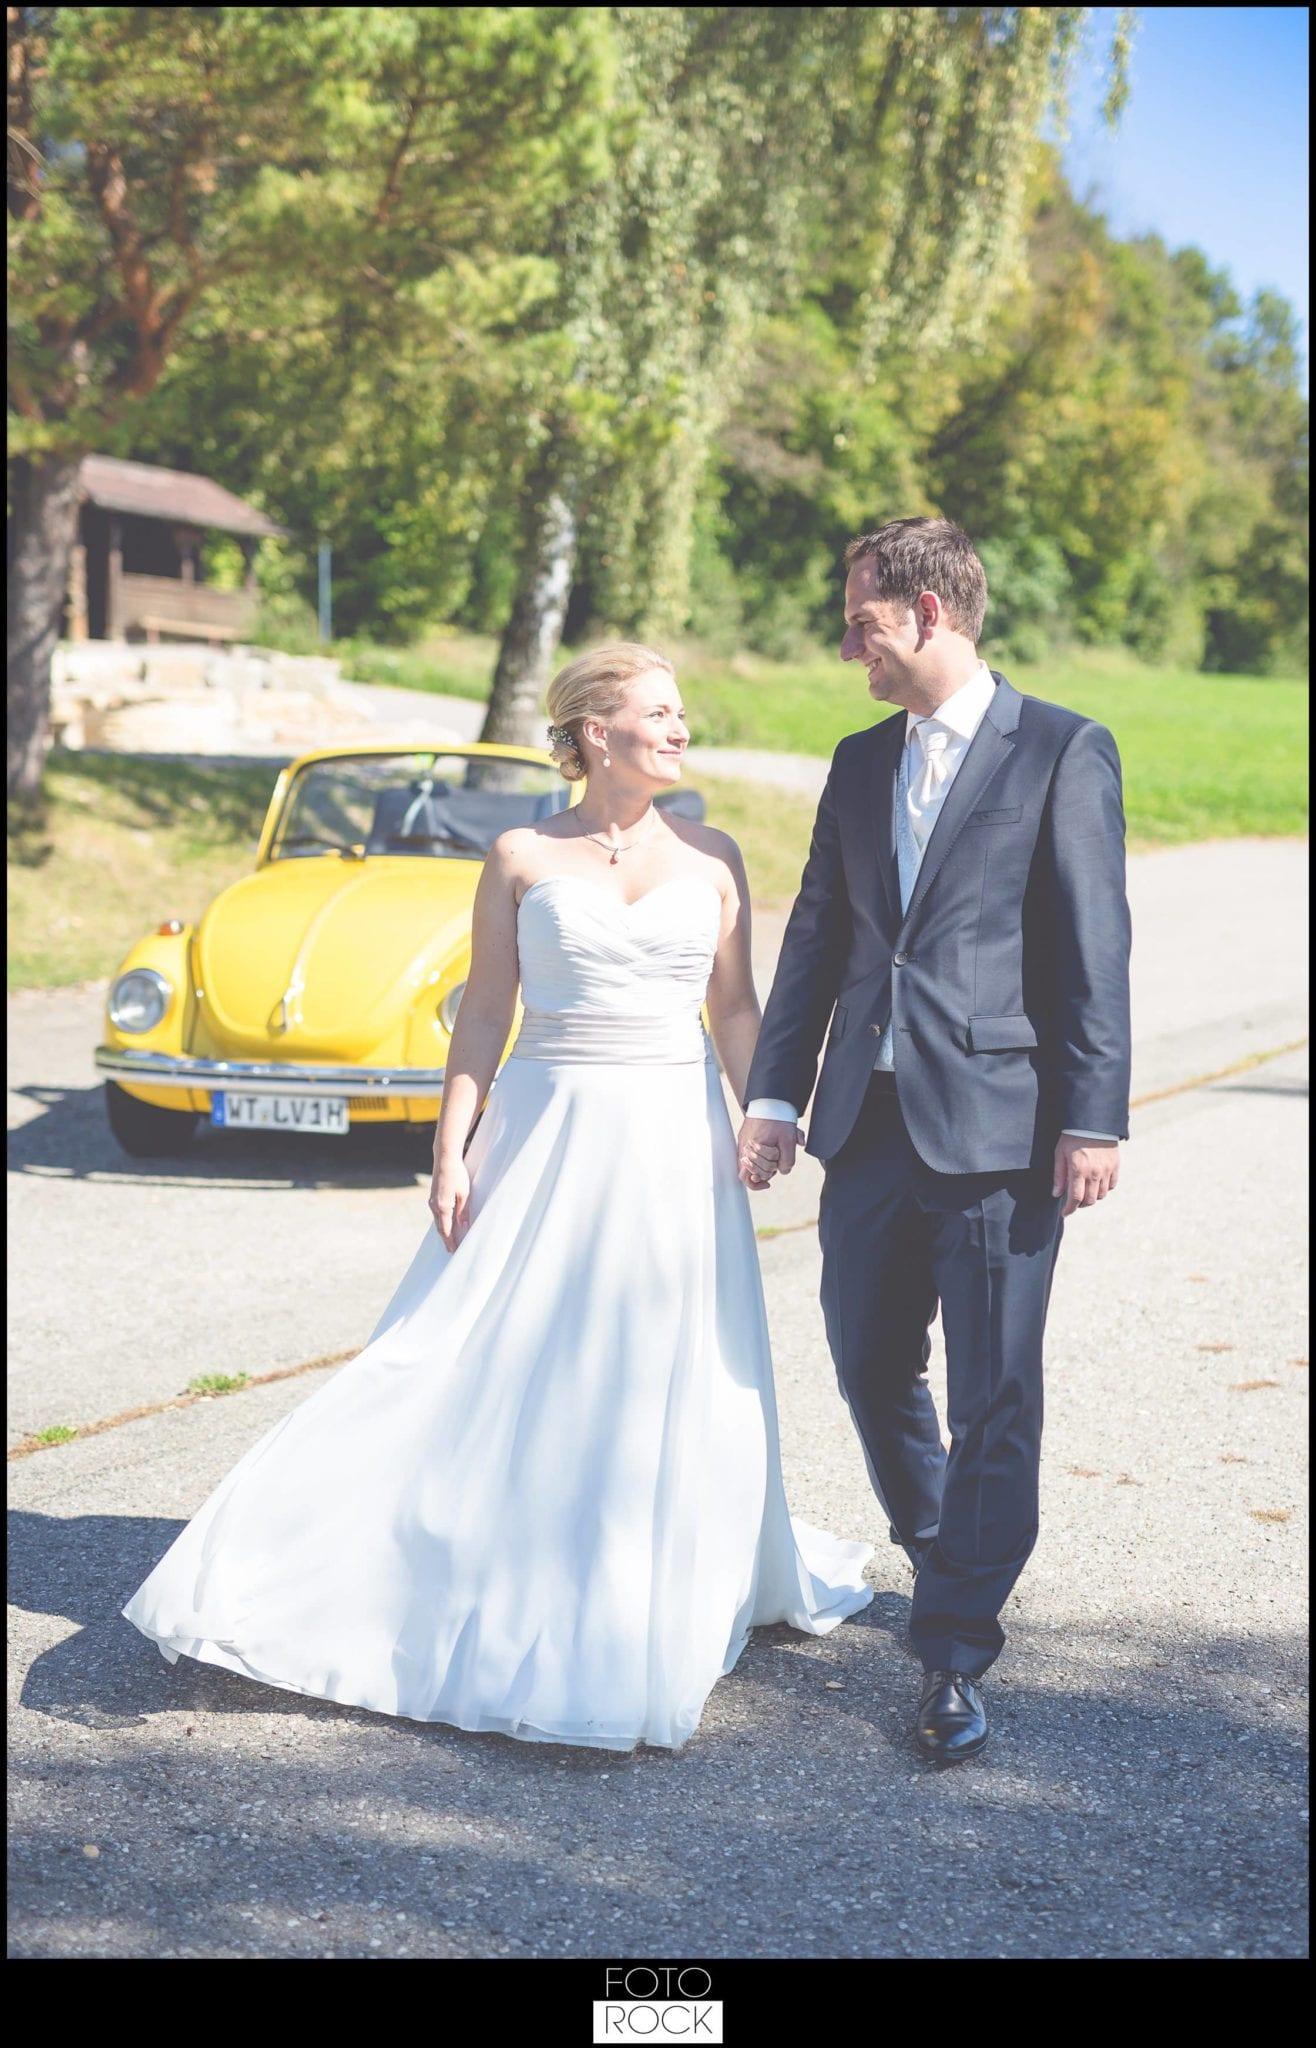 Hochzeit Adler Haeusern brautpaar vw käfer straße